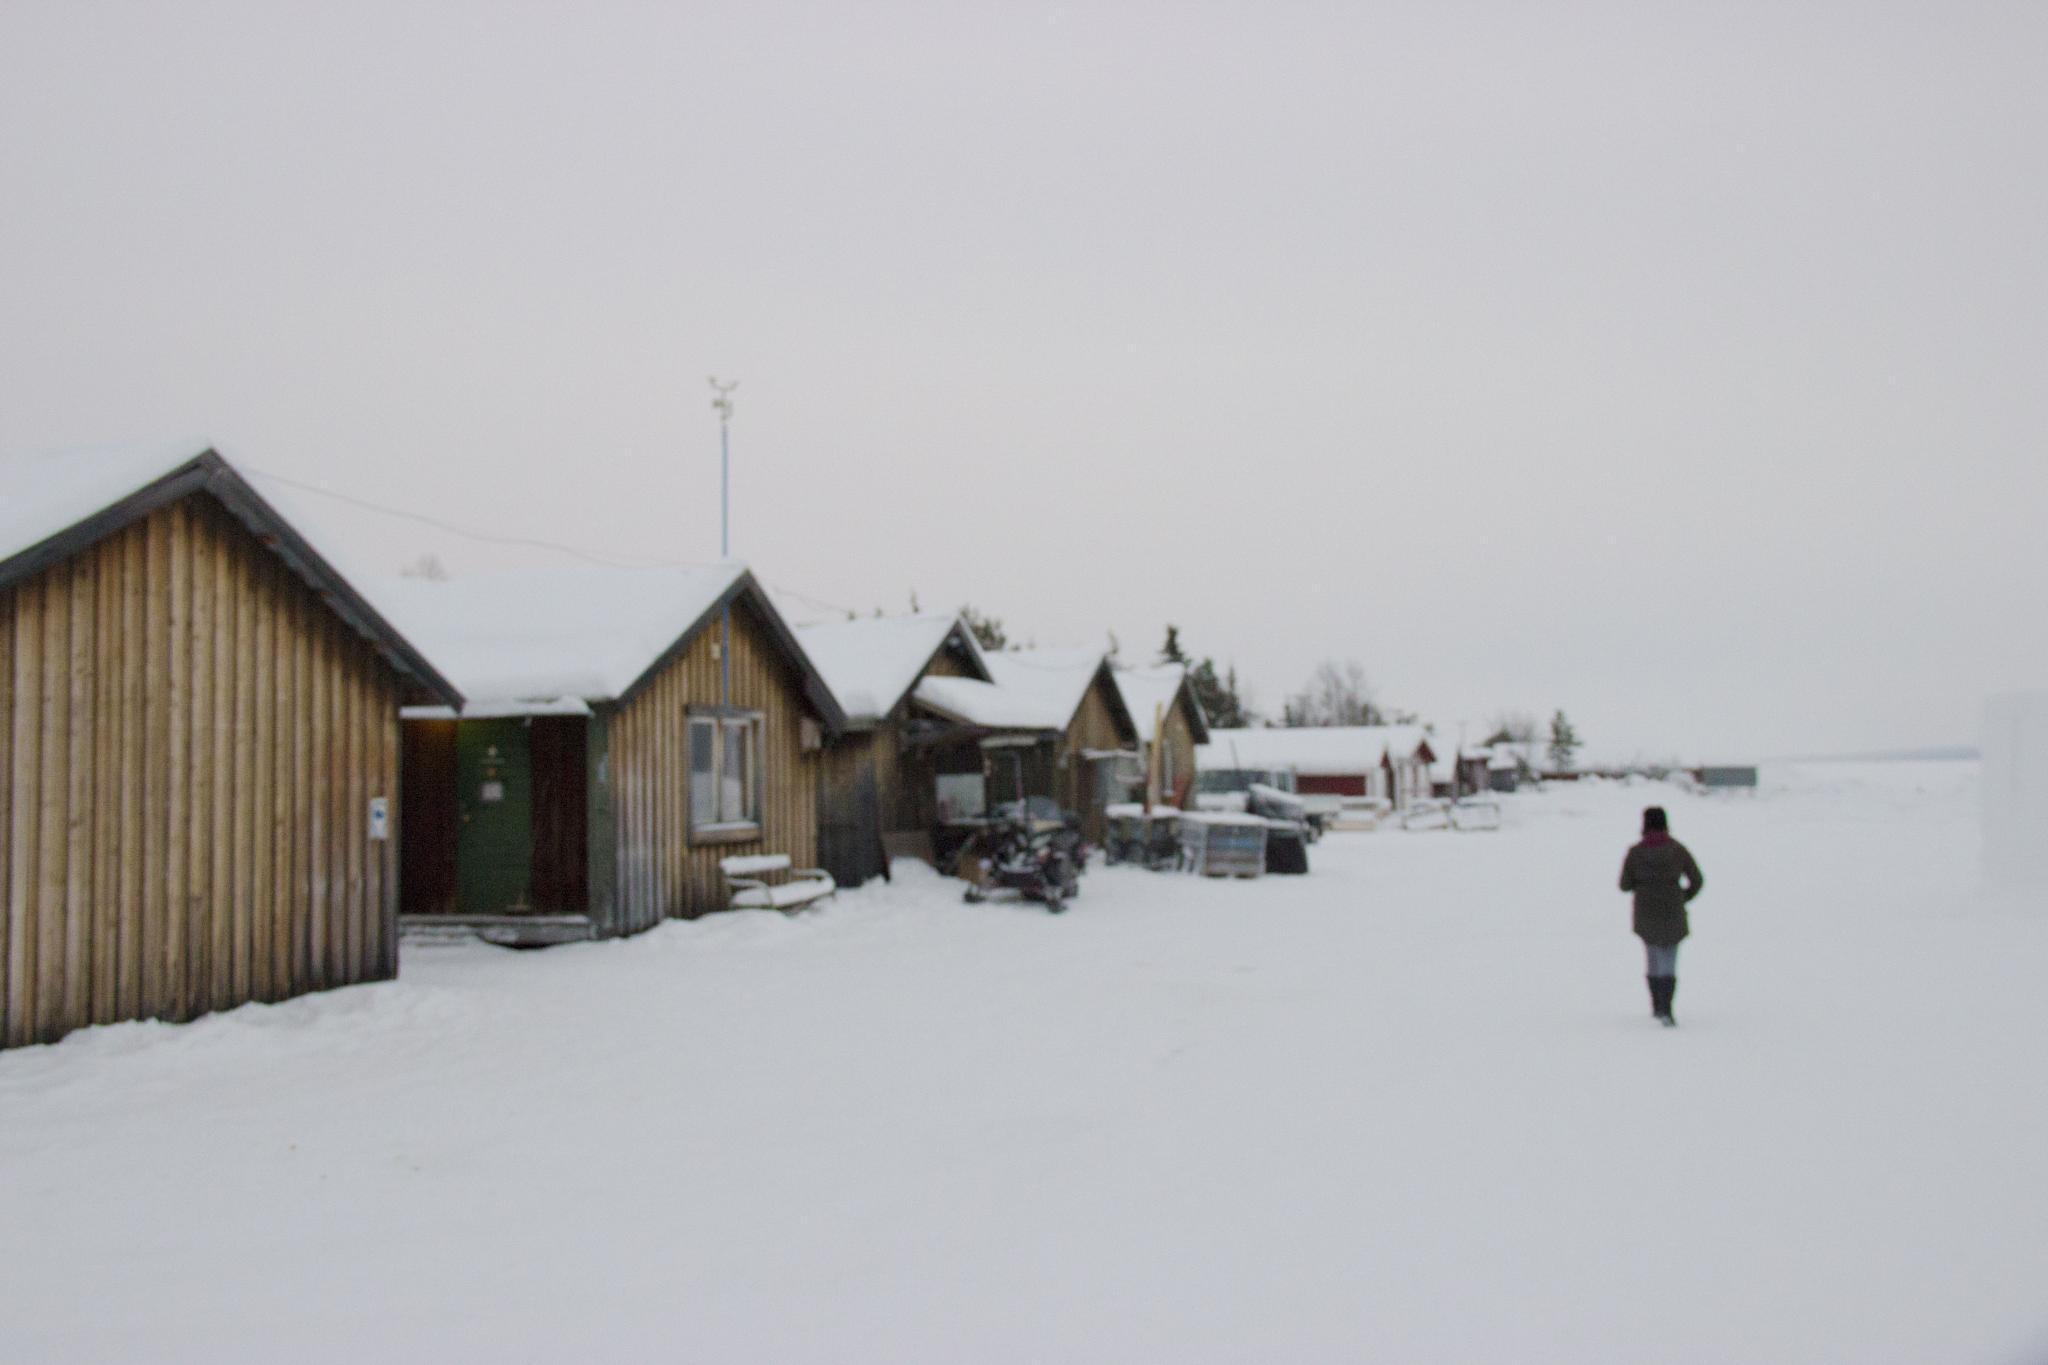 Swedish lapland by Nasta